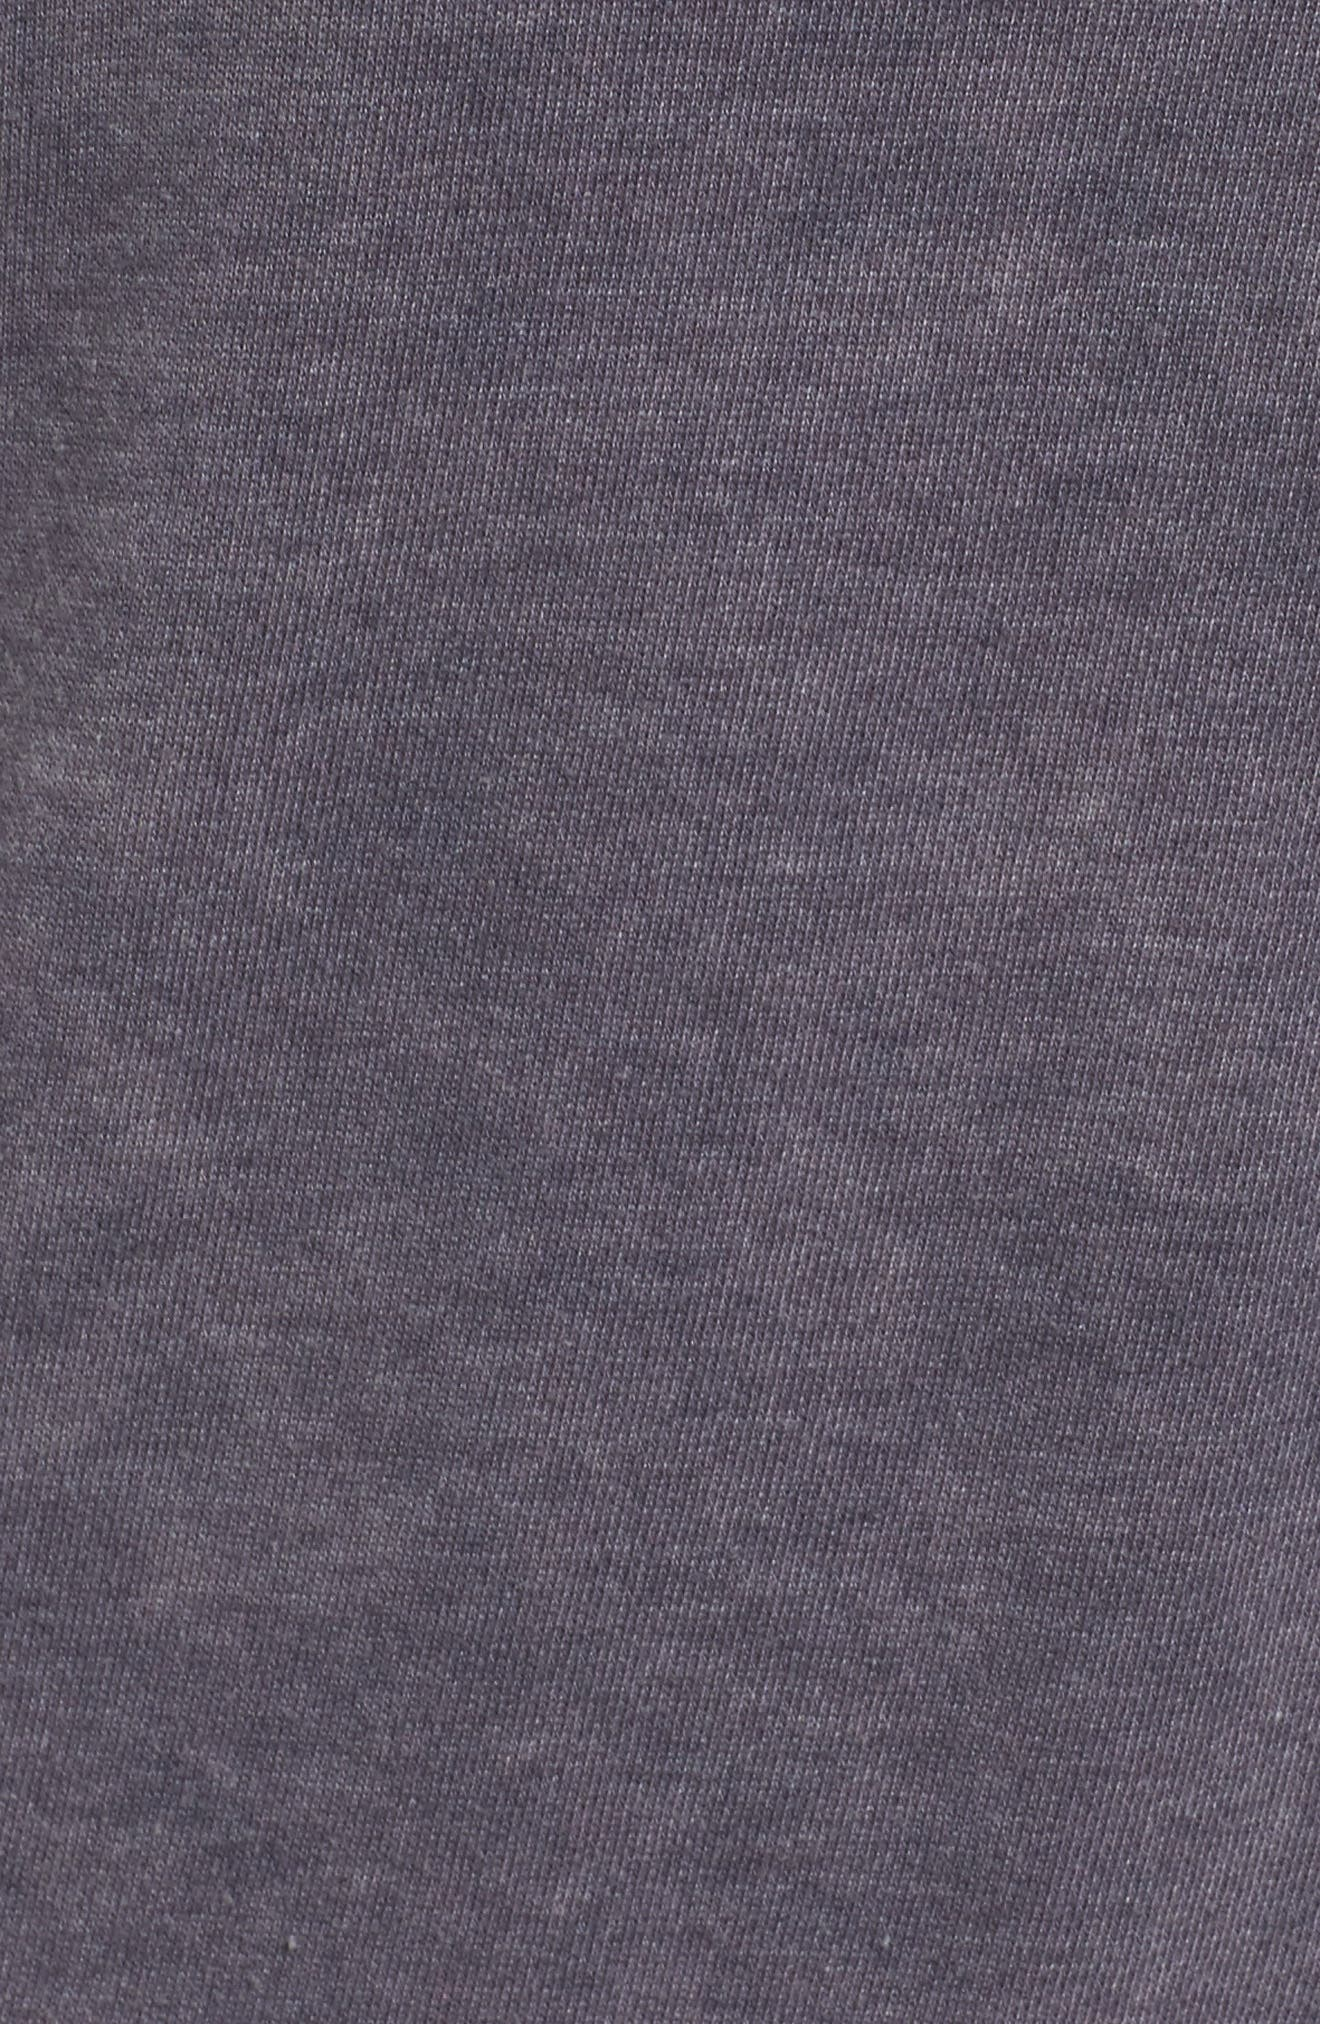 Beatles Pullover,                             Alternate thumbnail 5, color,                             Night Blue